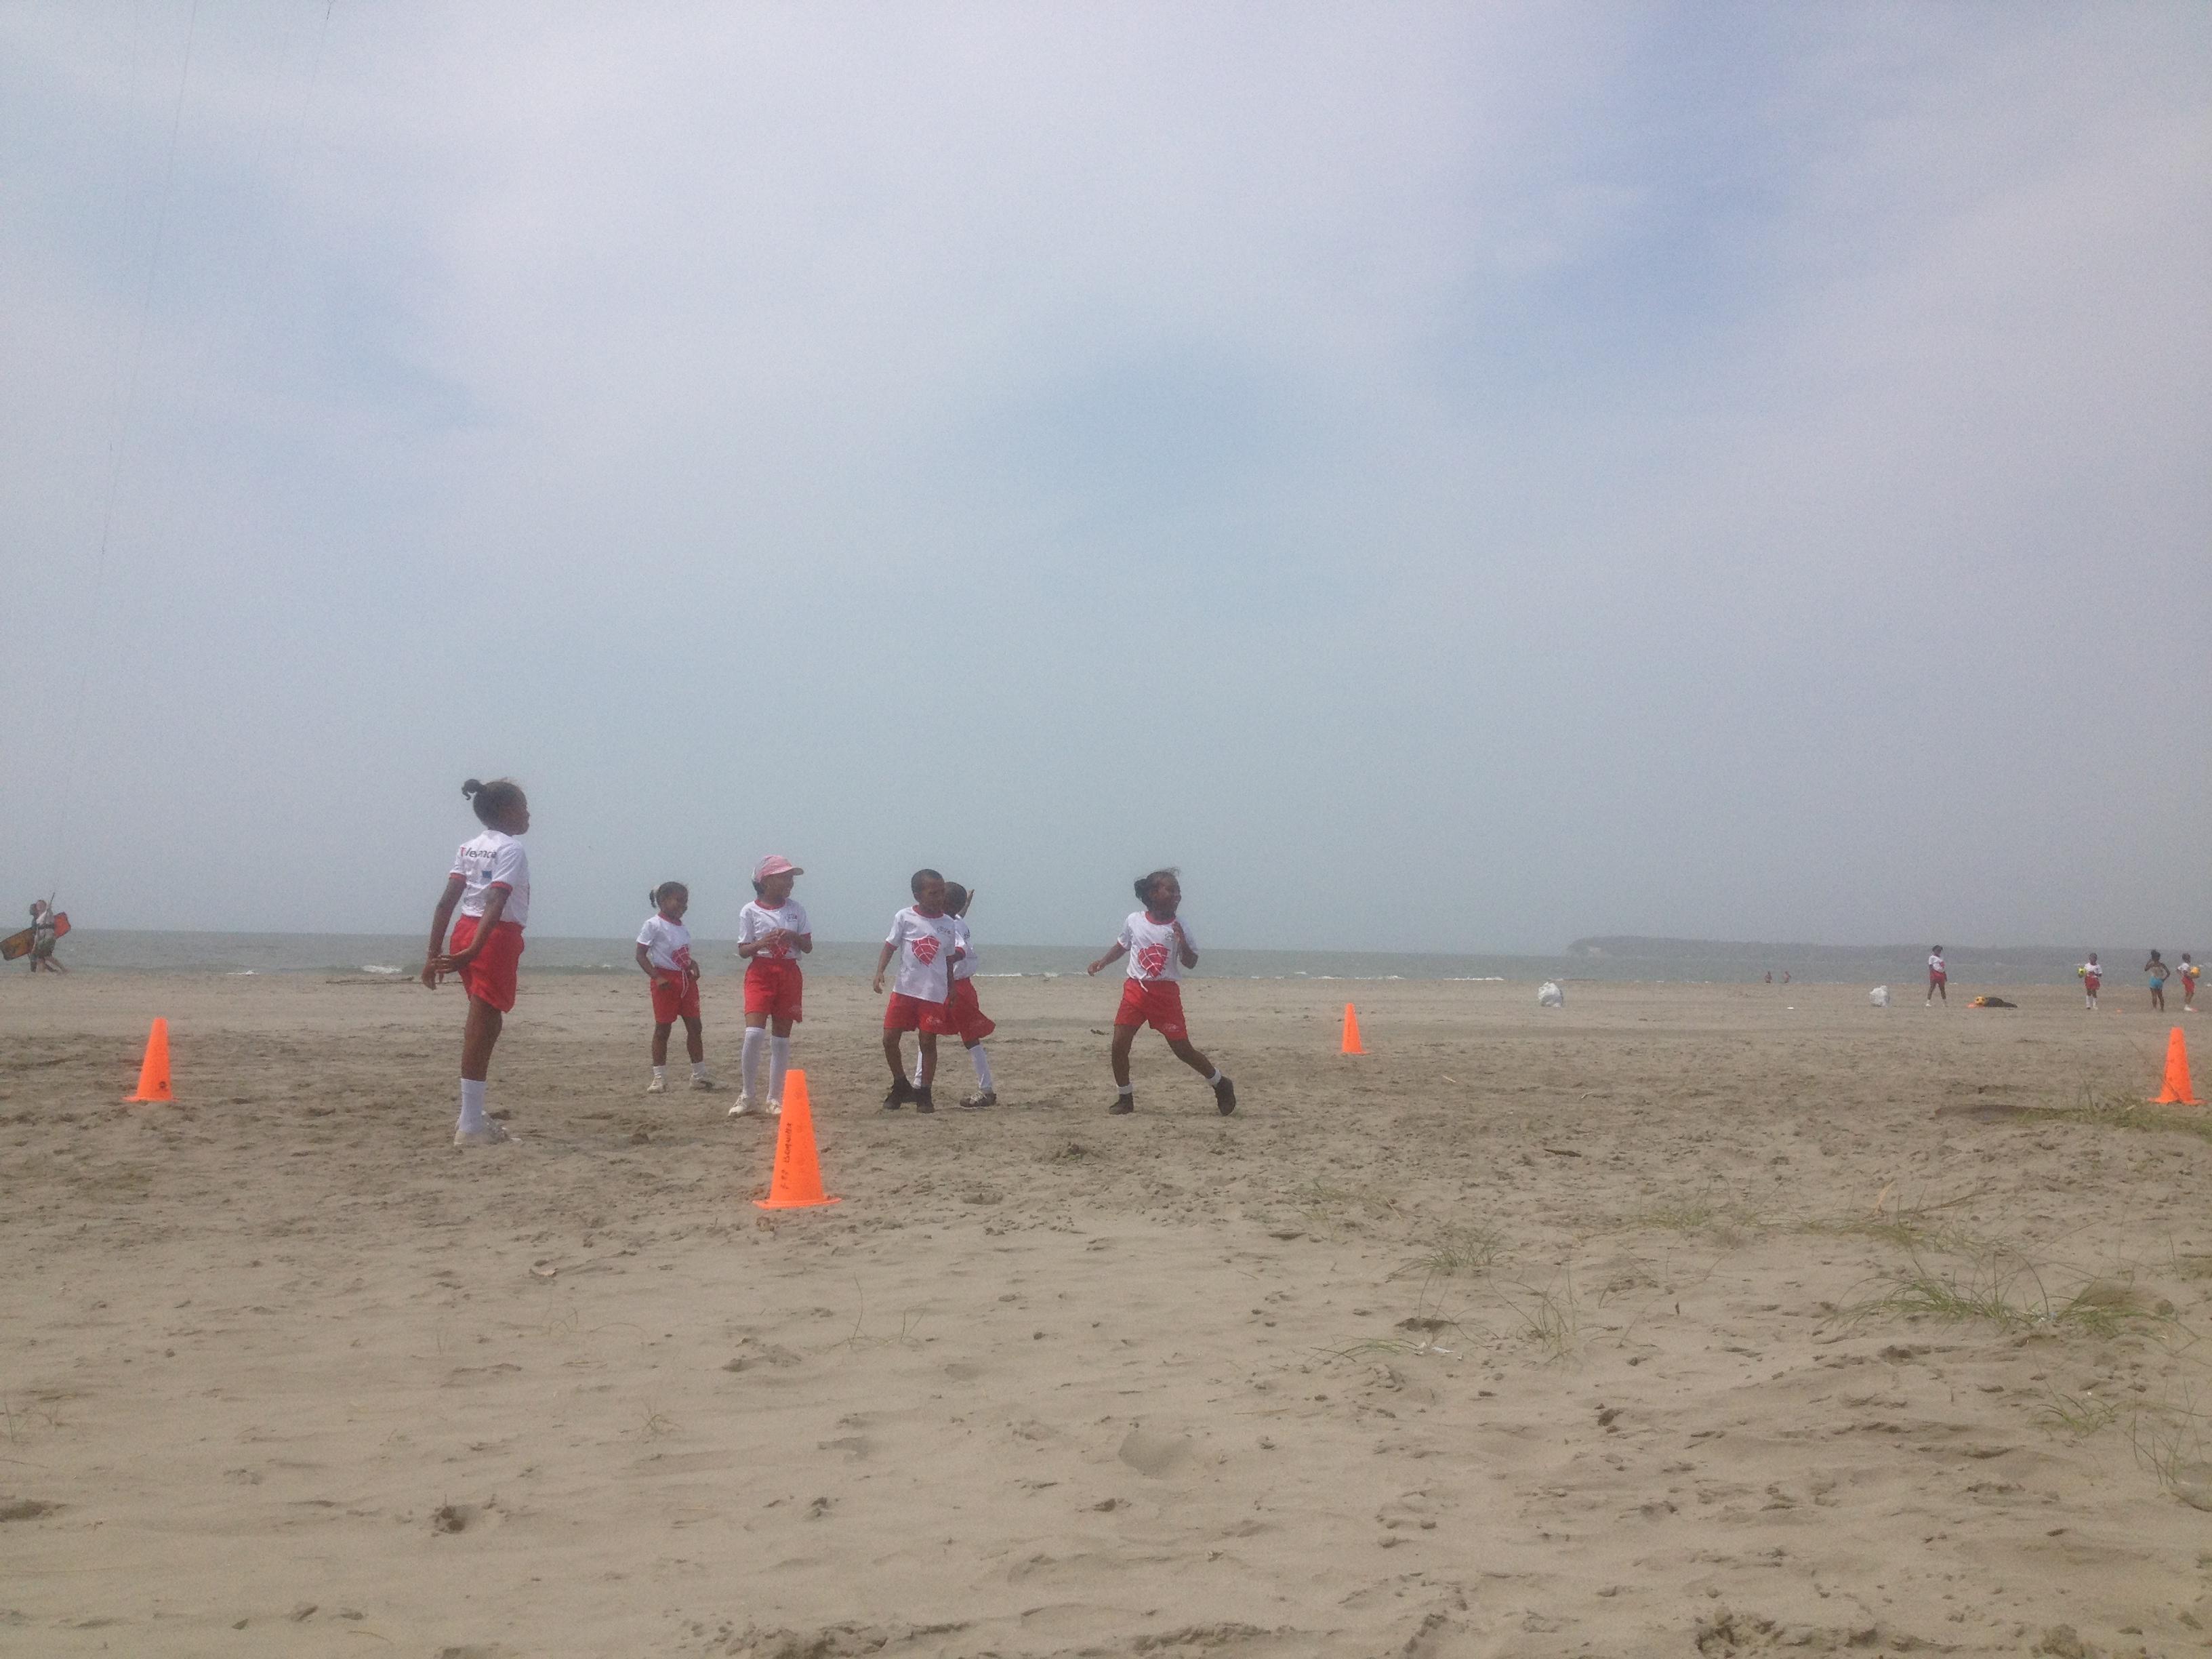 Dodgeball on the beach